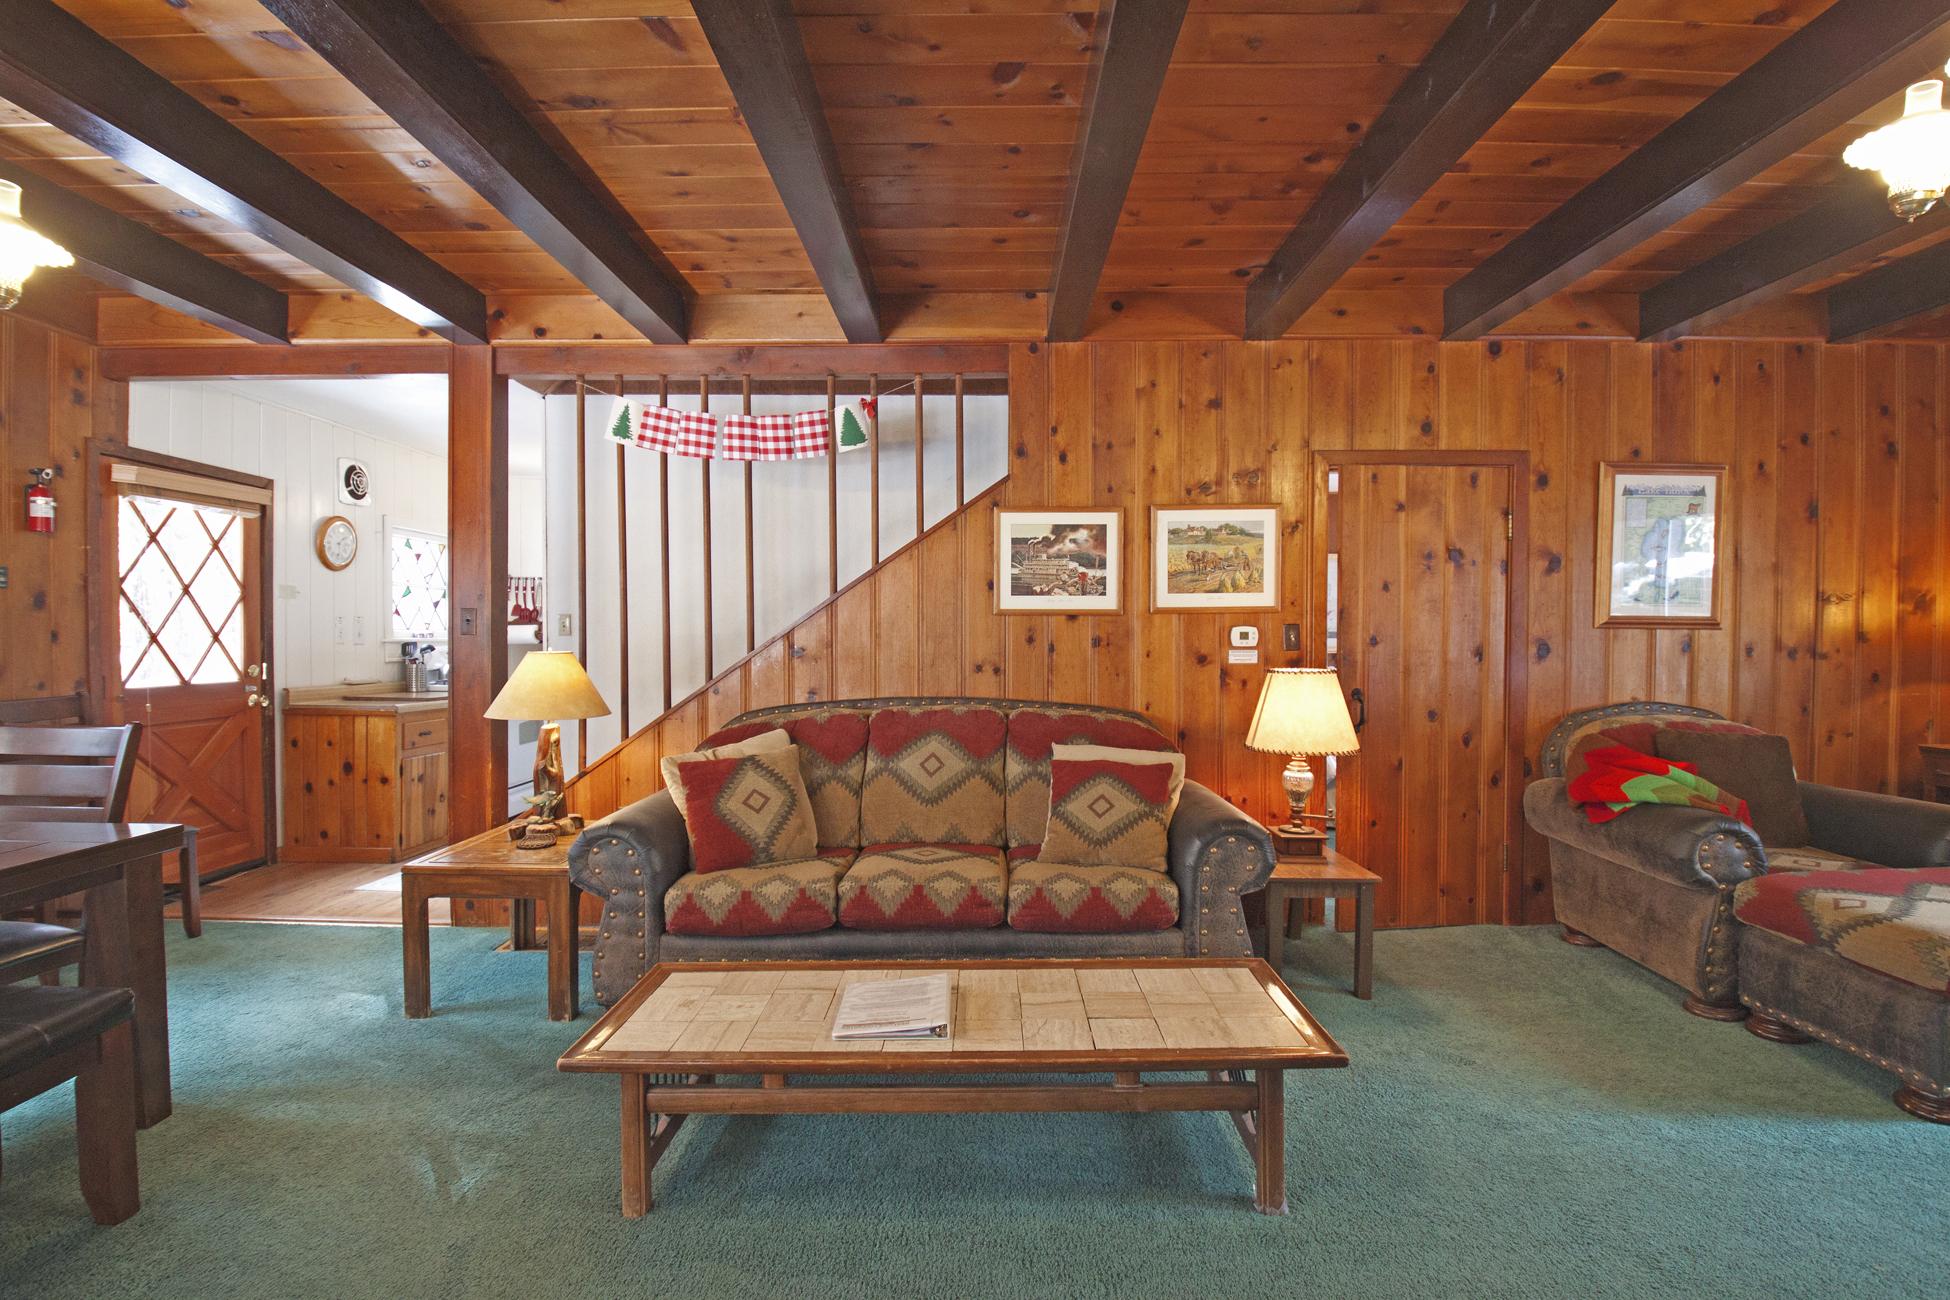 Listing Image 8 for Quandt Cabin